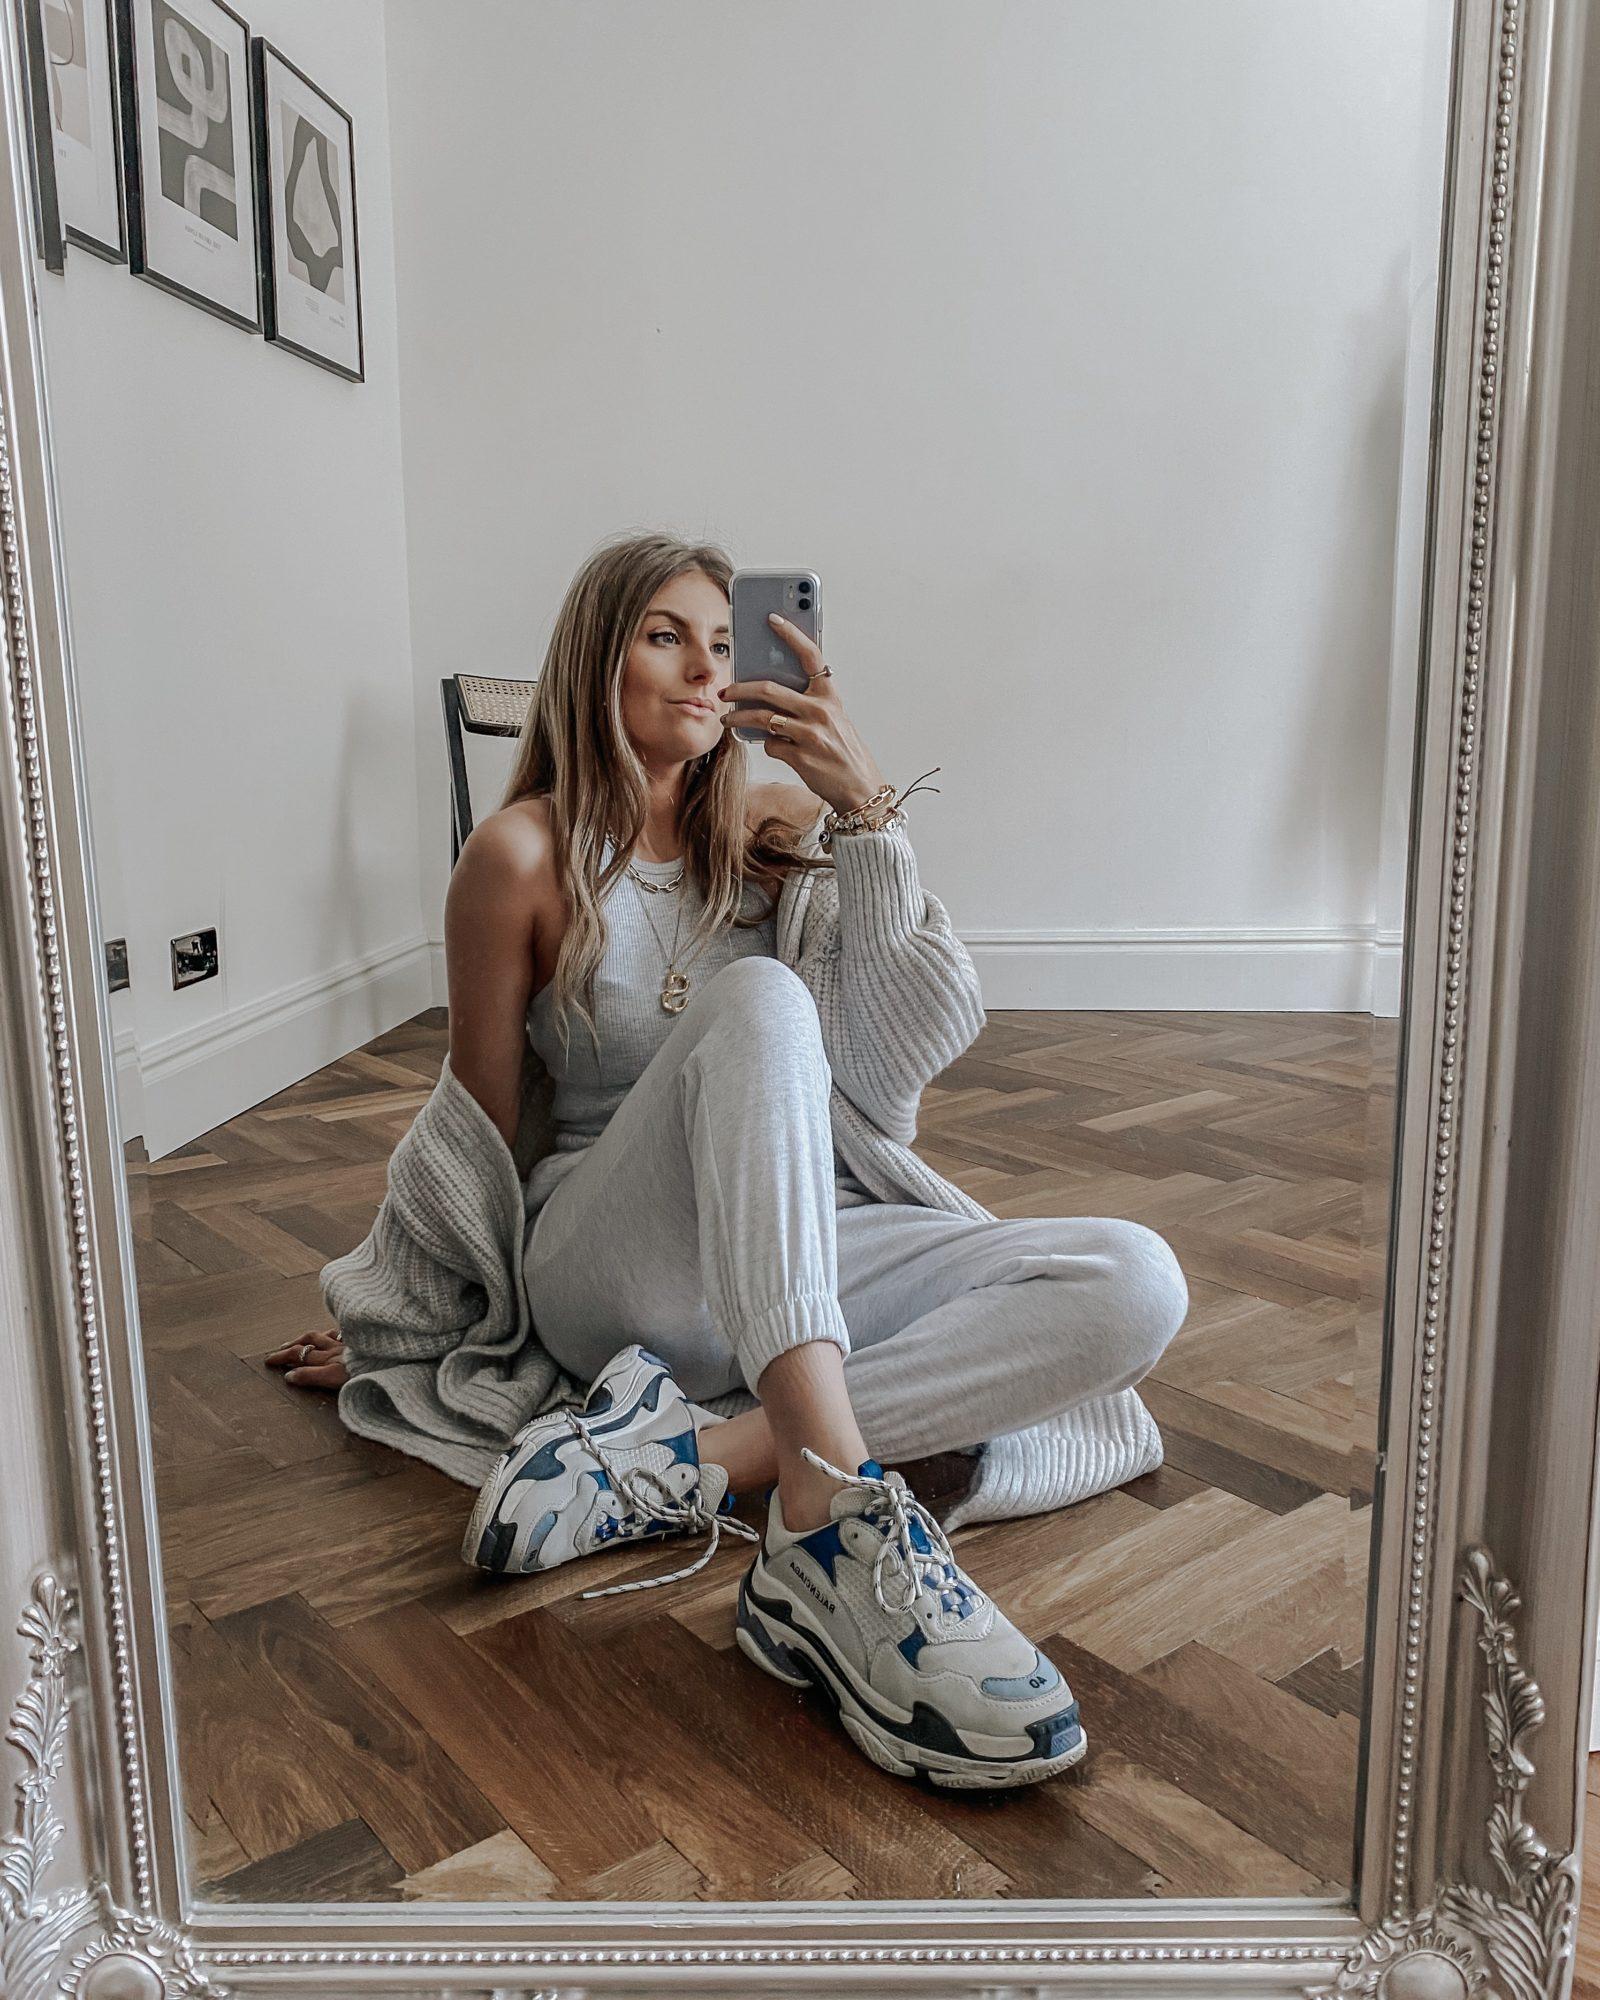 Styling Joggers - Grey Loungewear - Topshop Joggers